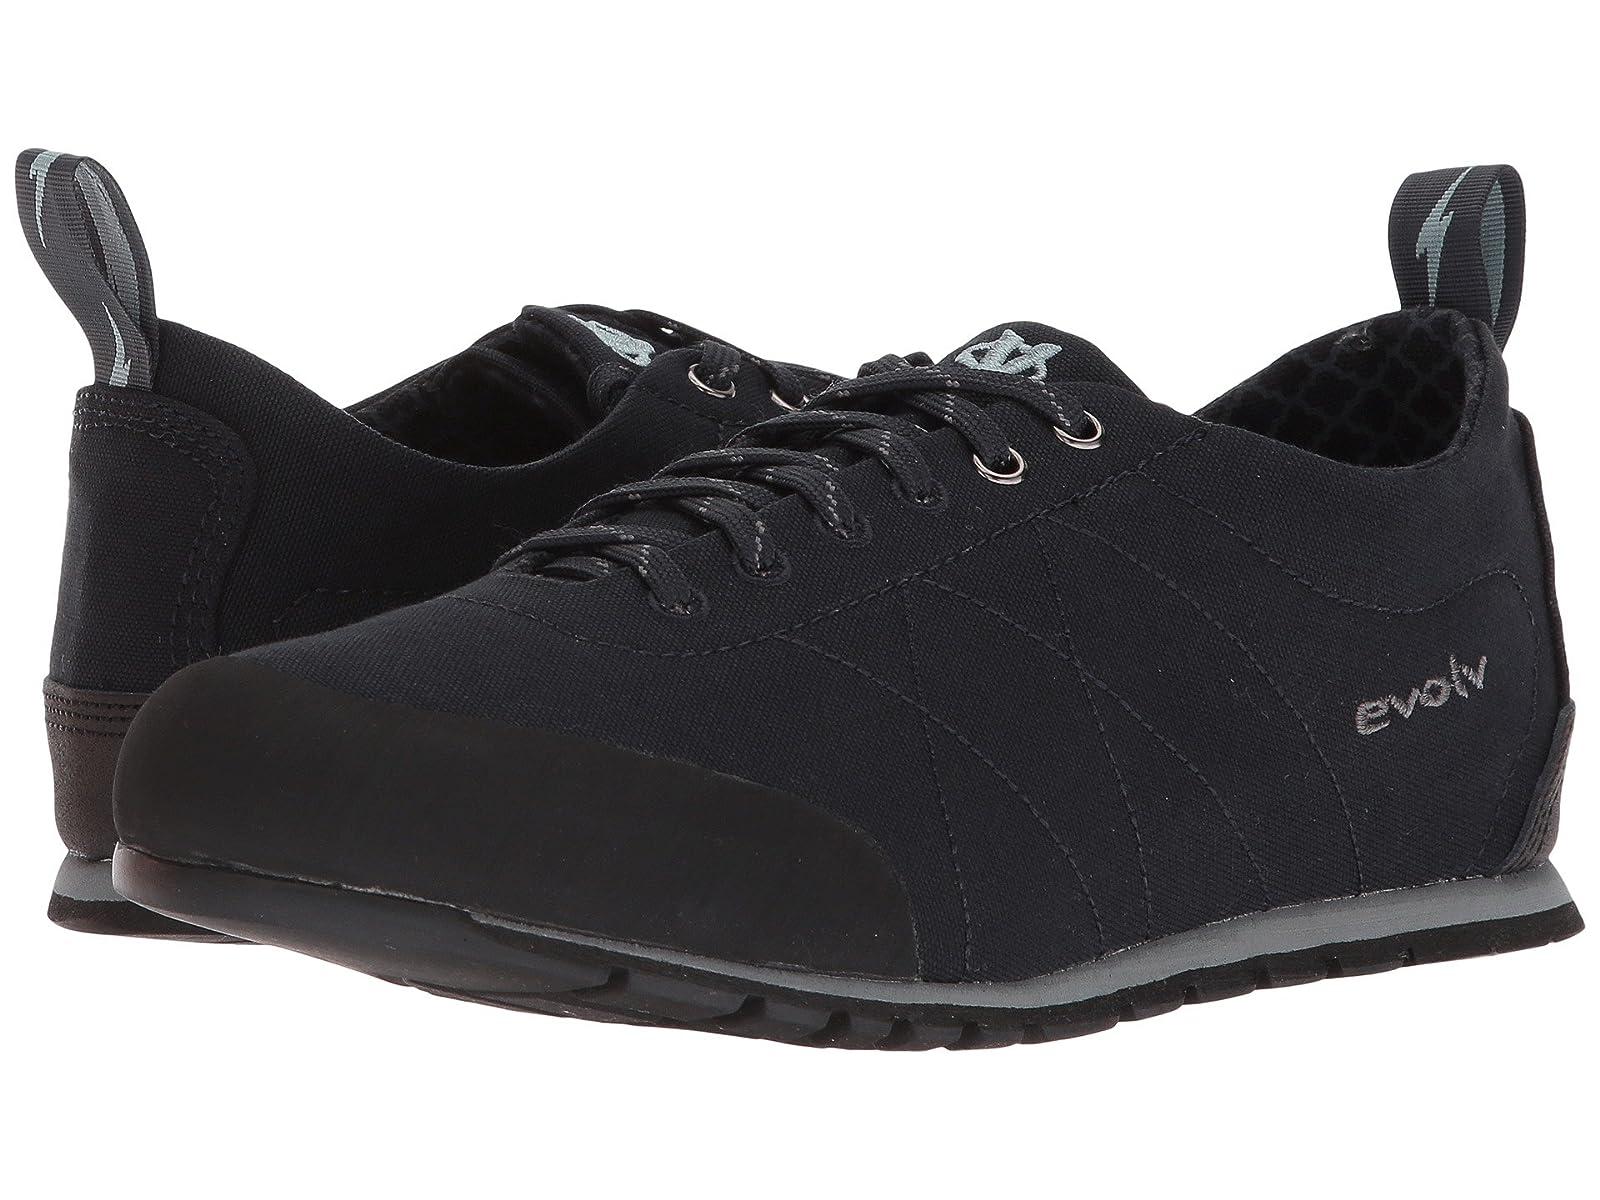 EVOLV Cruzer PsycheAtmospheric grades have affordable shoes